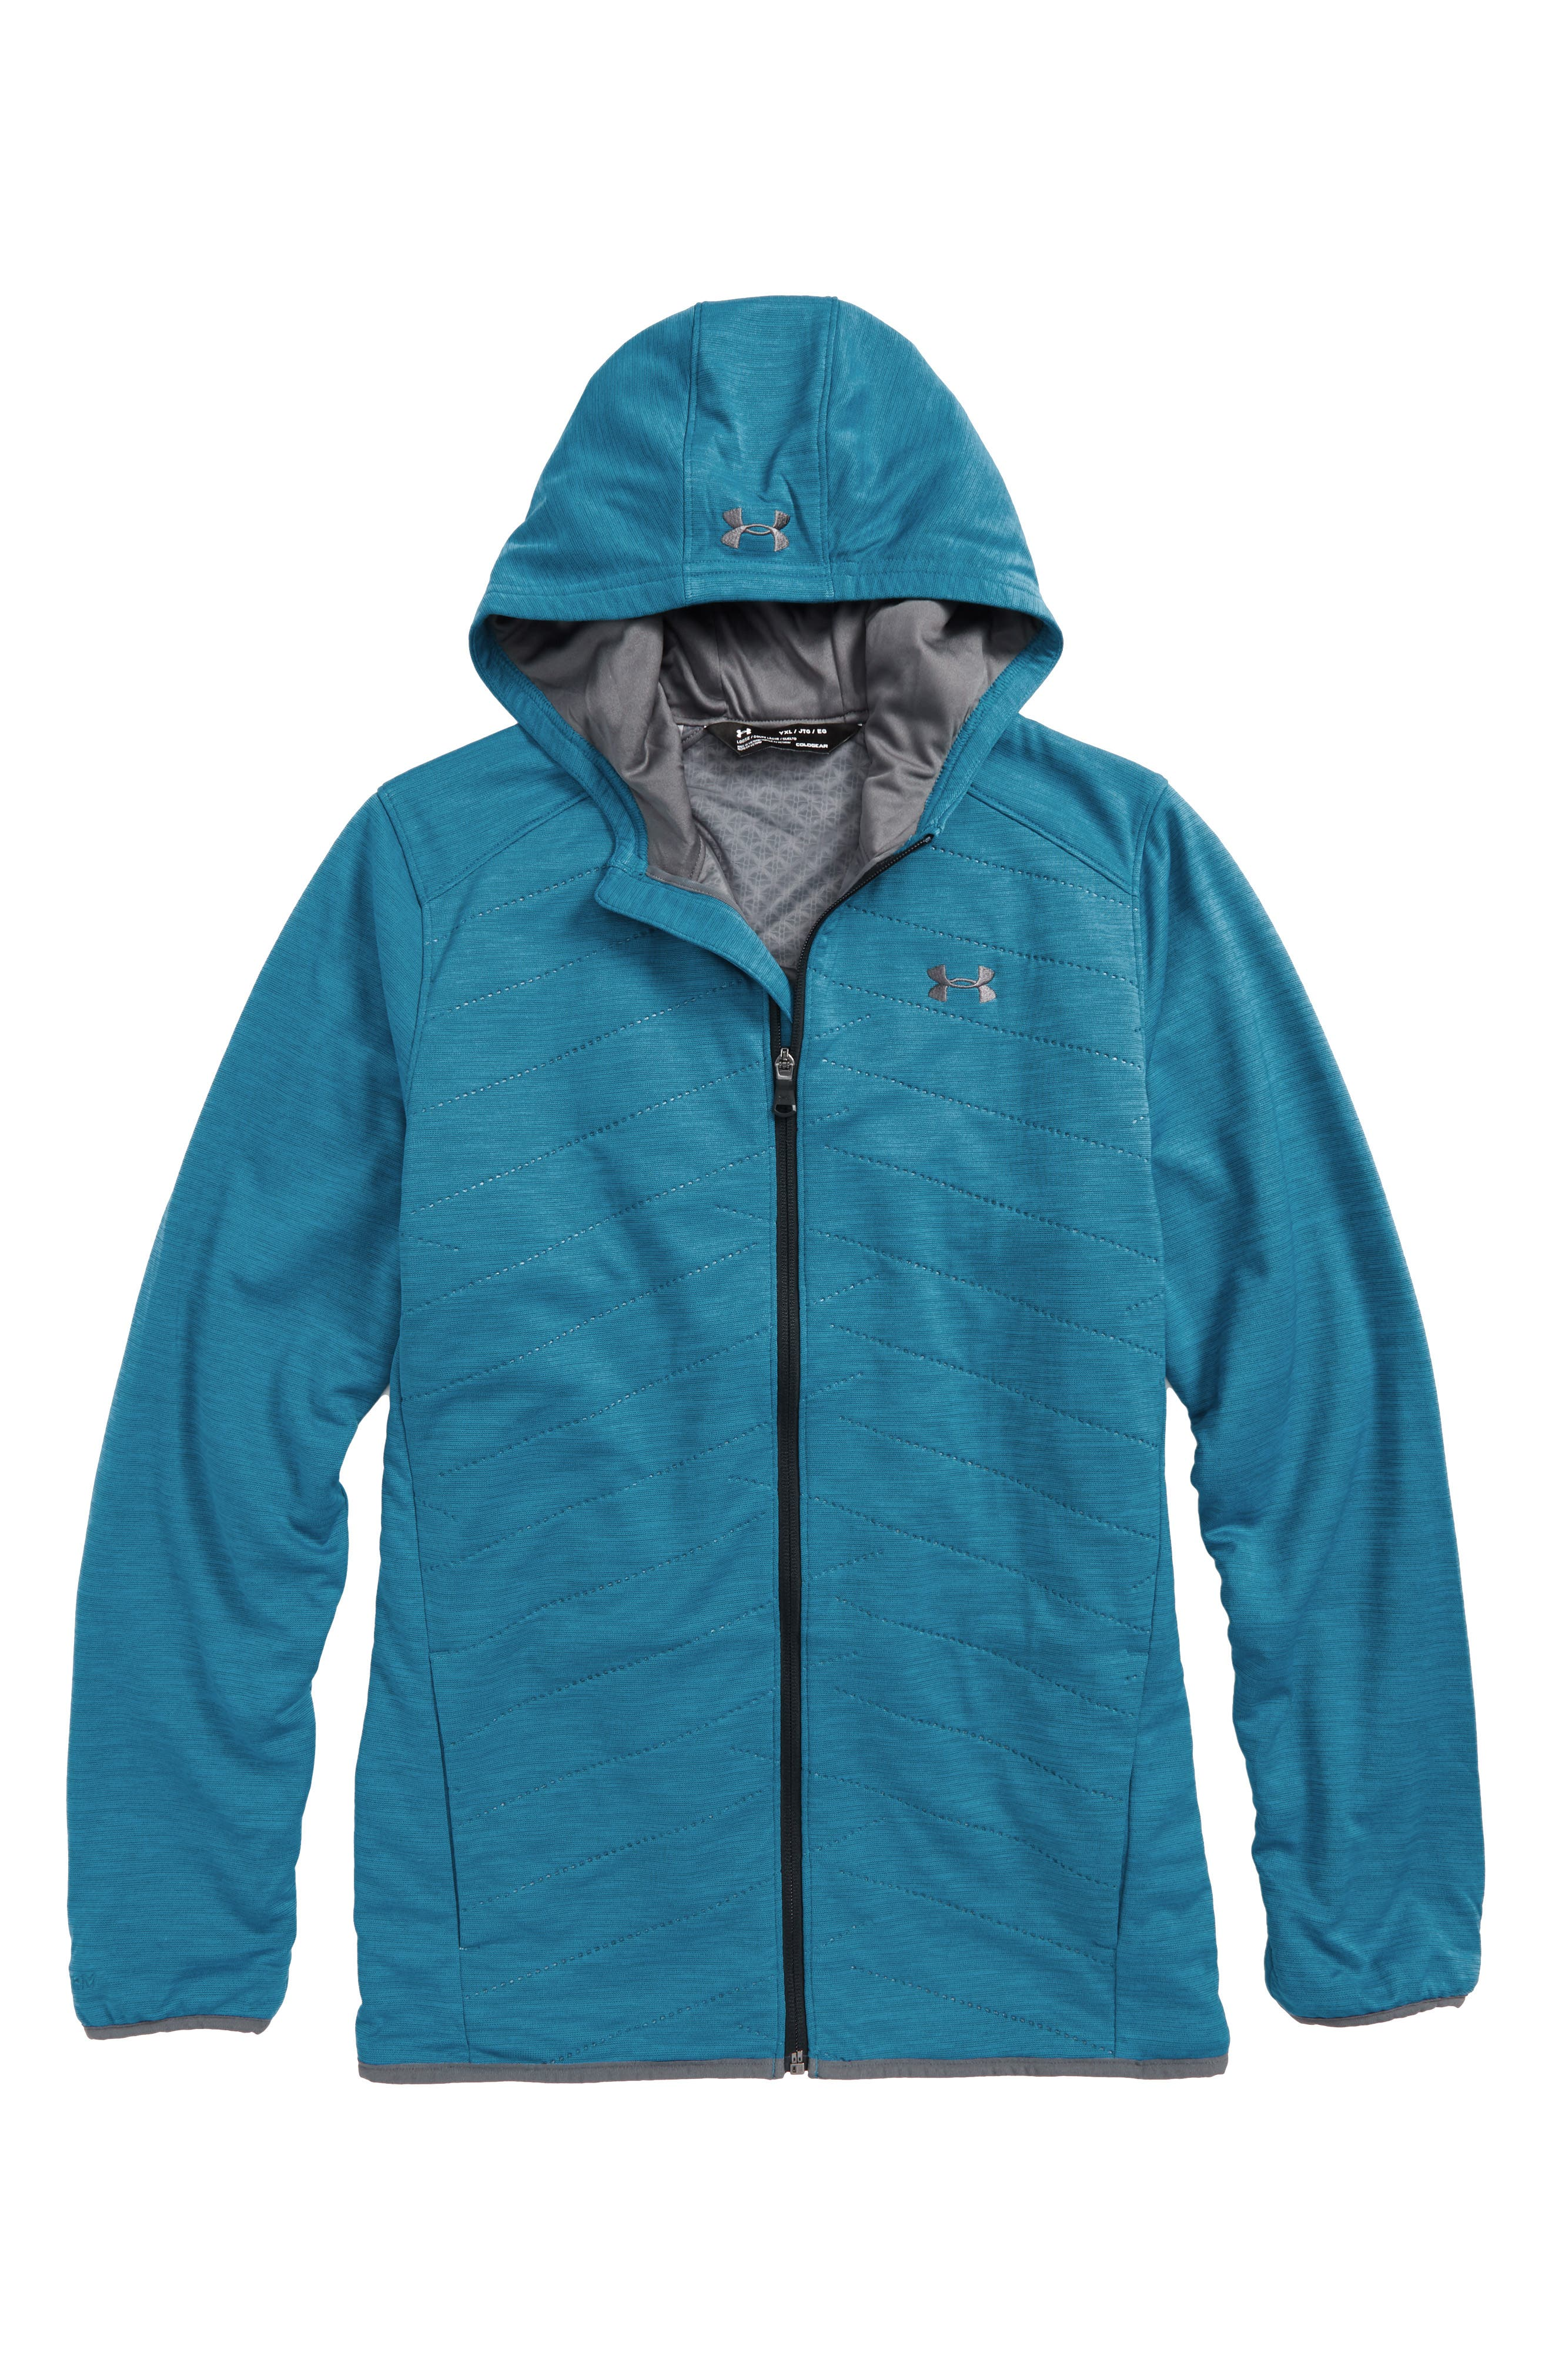 ColdGear<sup>®</sup> Reactor Hybrid Hooded Jacket,                             Main thumbnail 3, color,